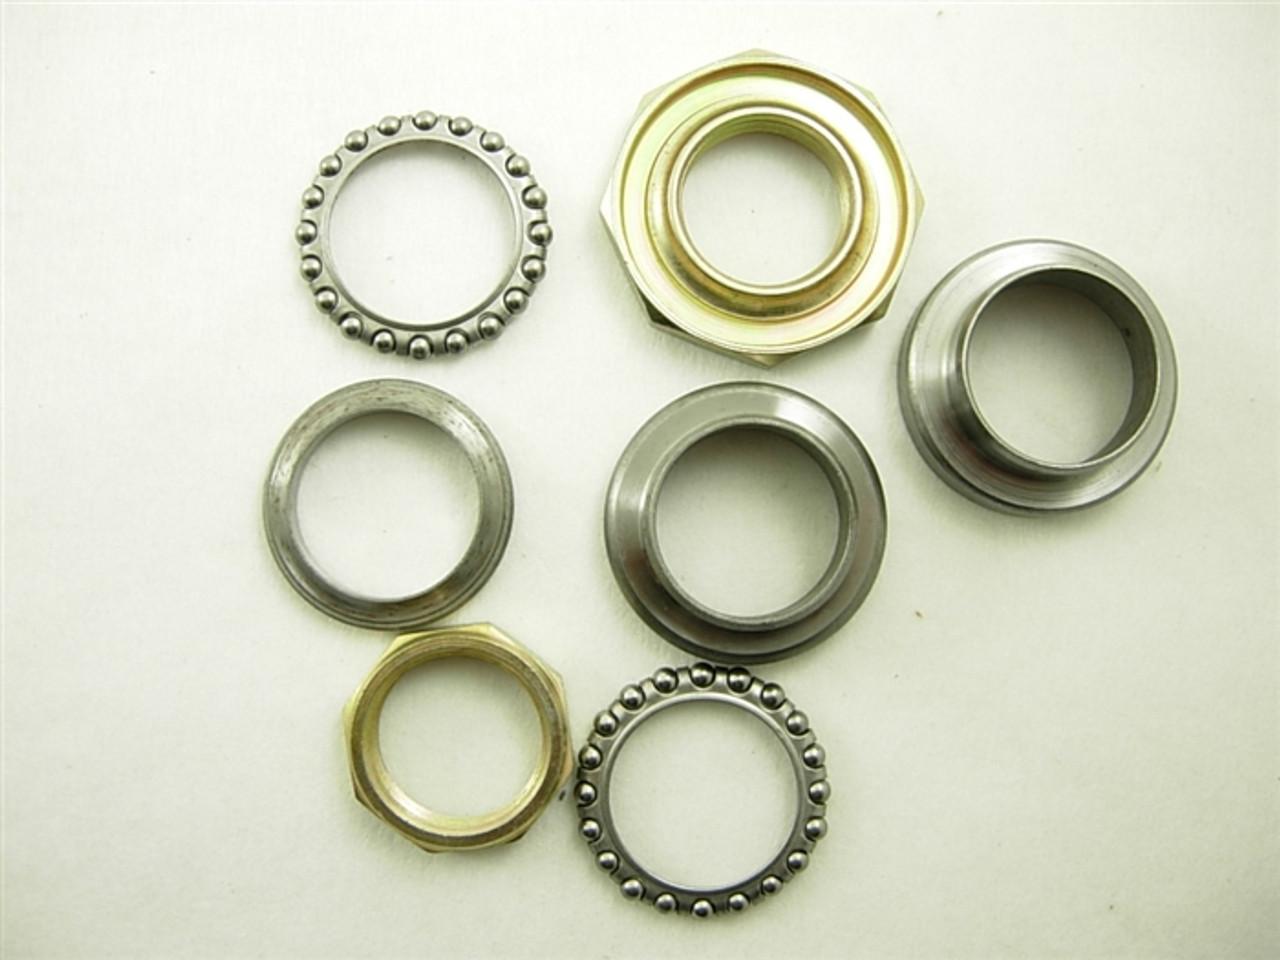 steering ball bearing 12561-a143-5